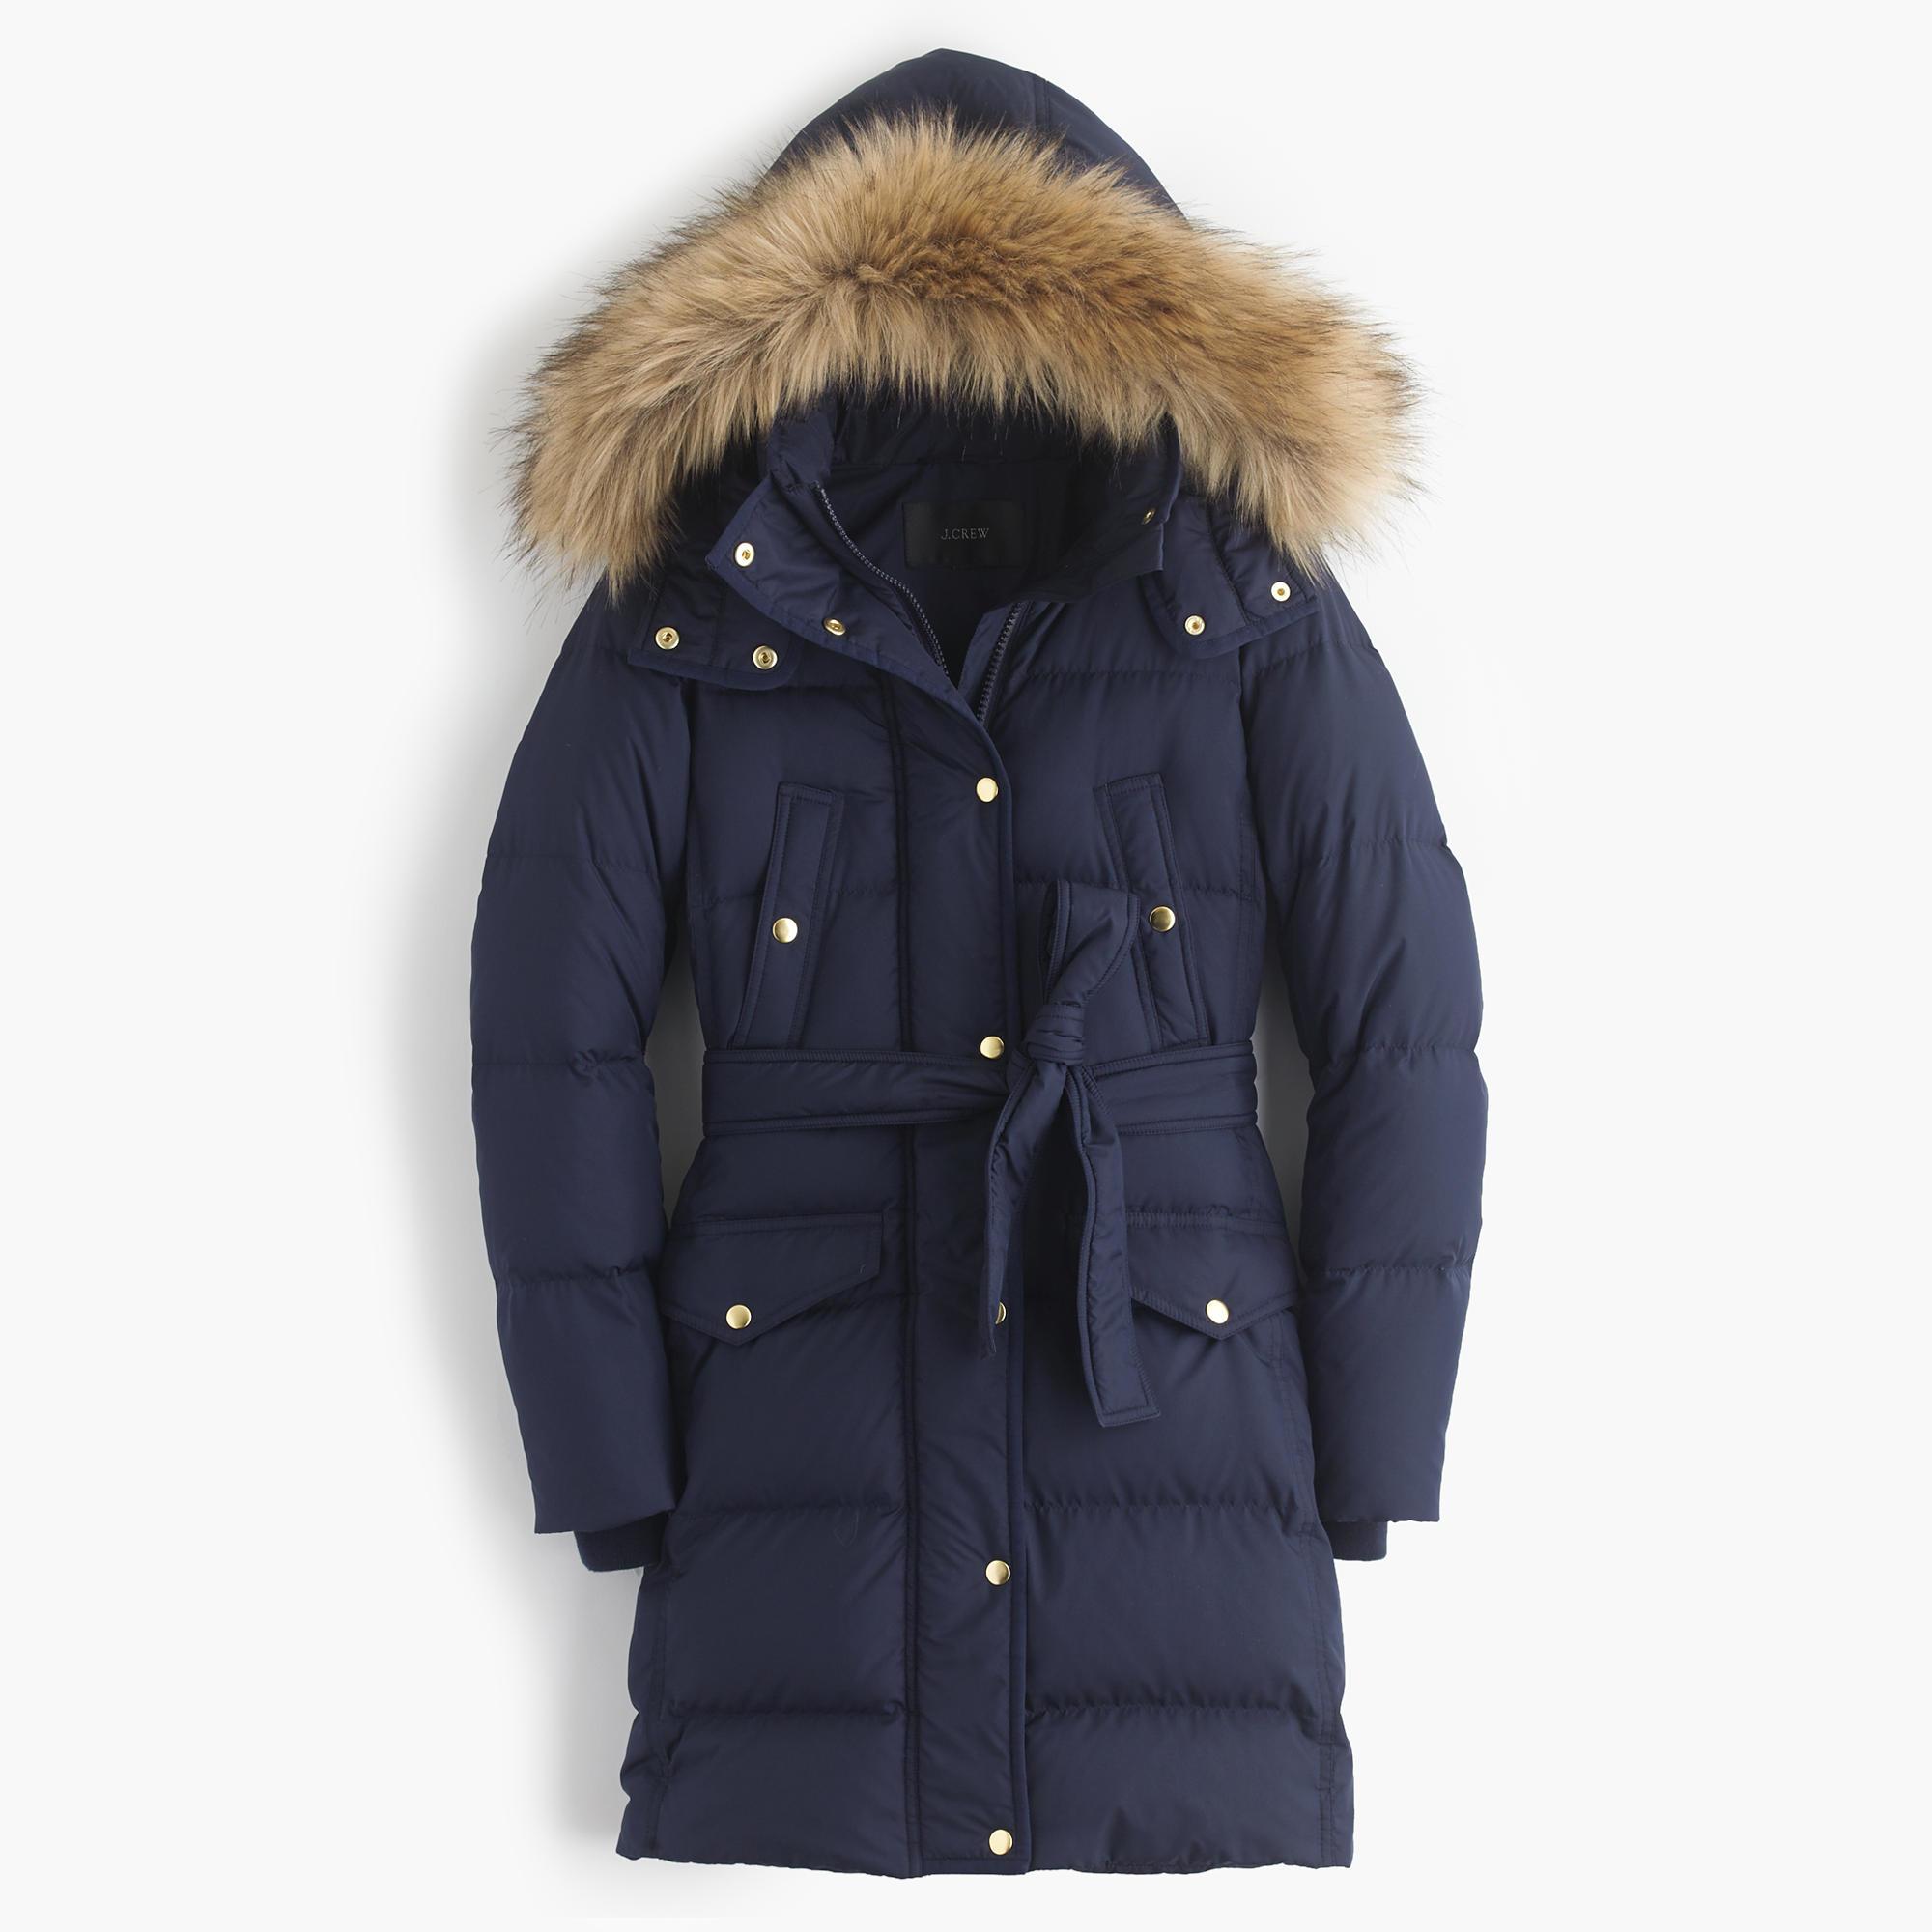 J Crew Tall Wintress Puffer Coat With Faux Fur Hood In